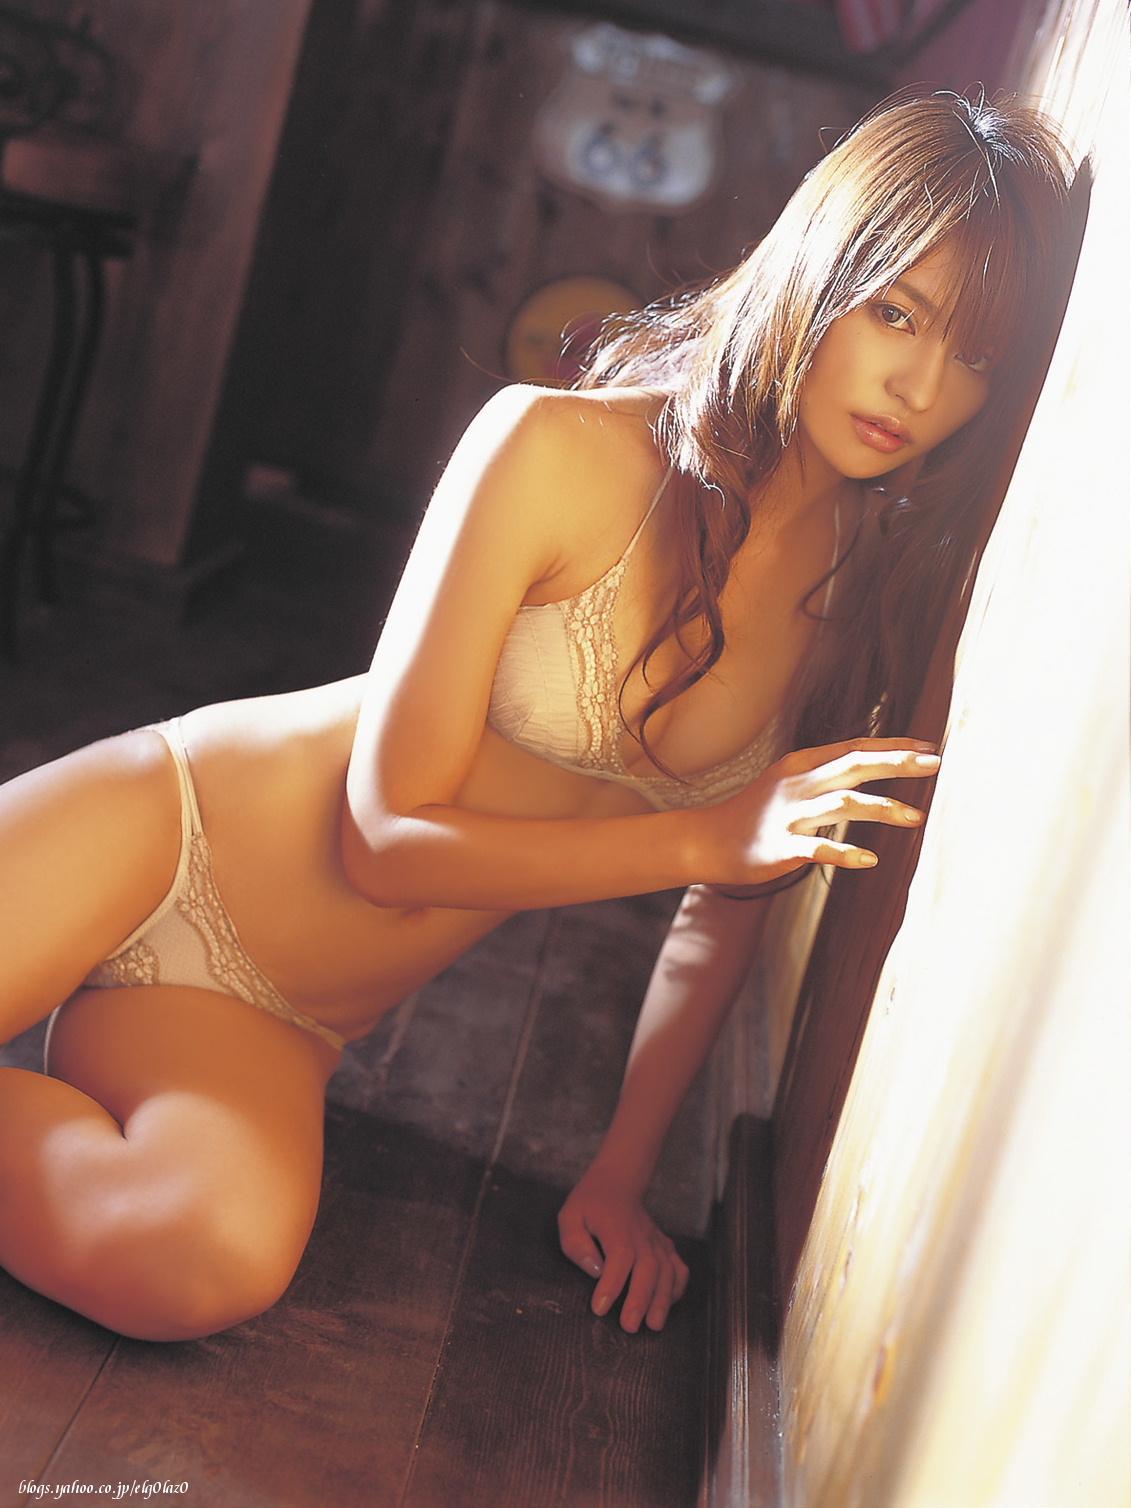 http://blog.cnobi.jp/v1/blog/user/a8c5c06266ed65ea9b67299e90592fa7/1303226159